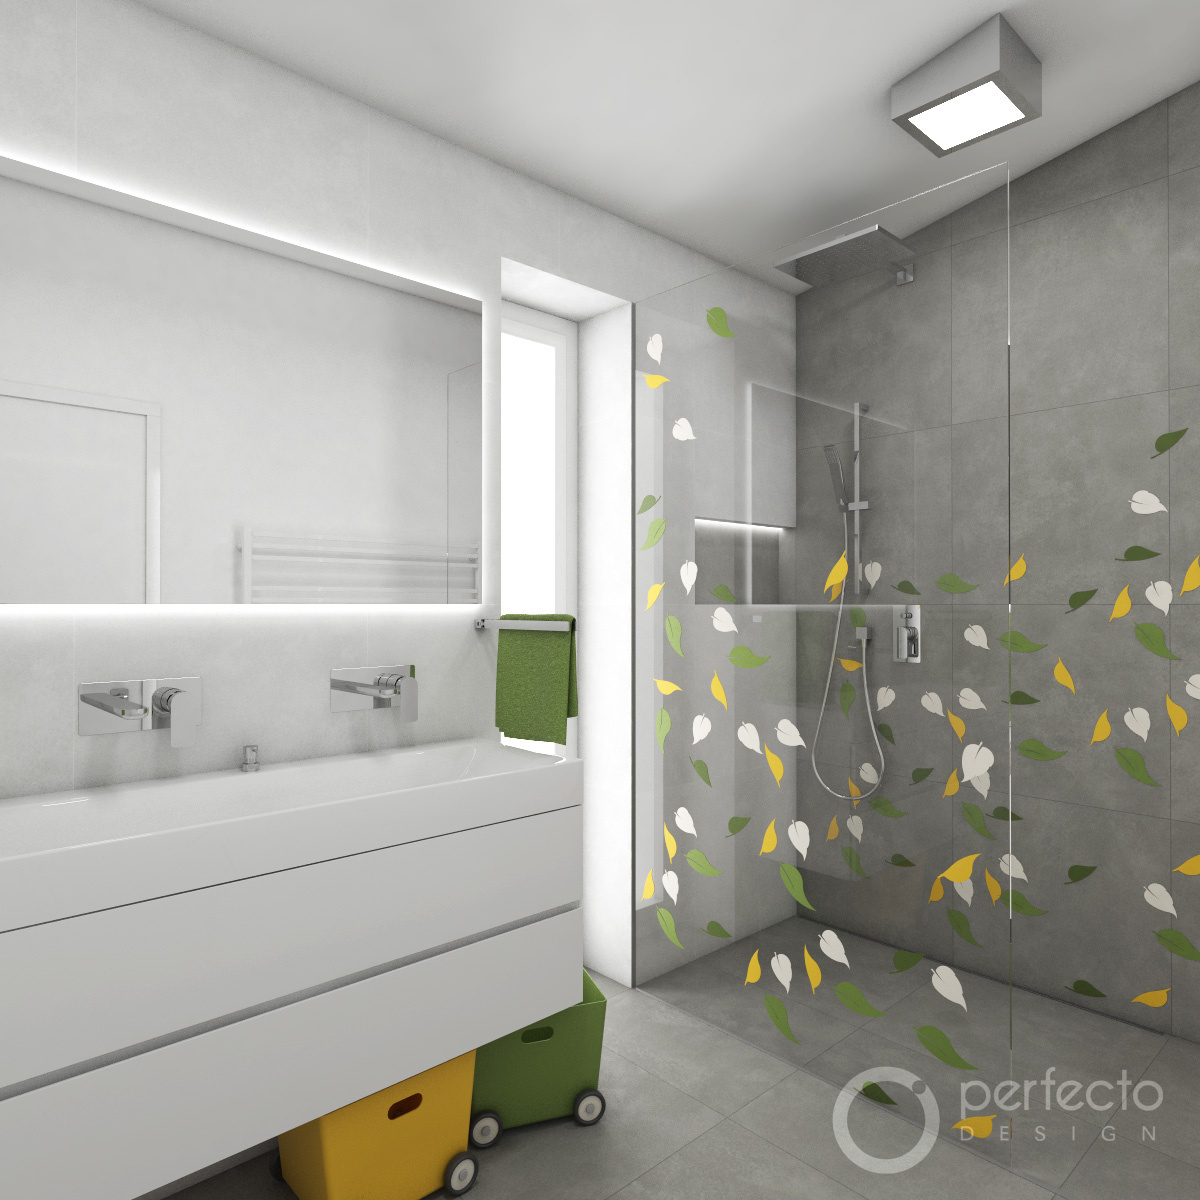 kinder-badezimmer origami | perfecto design, Badezimmer